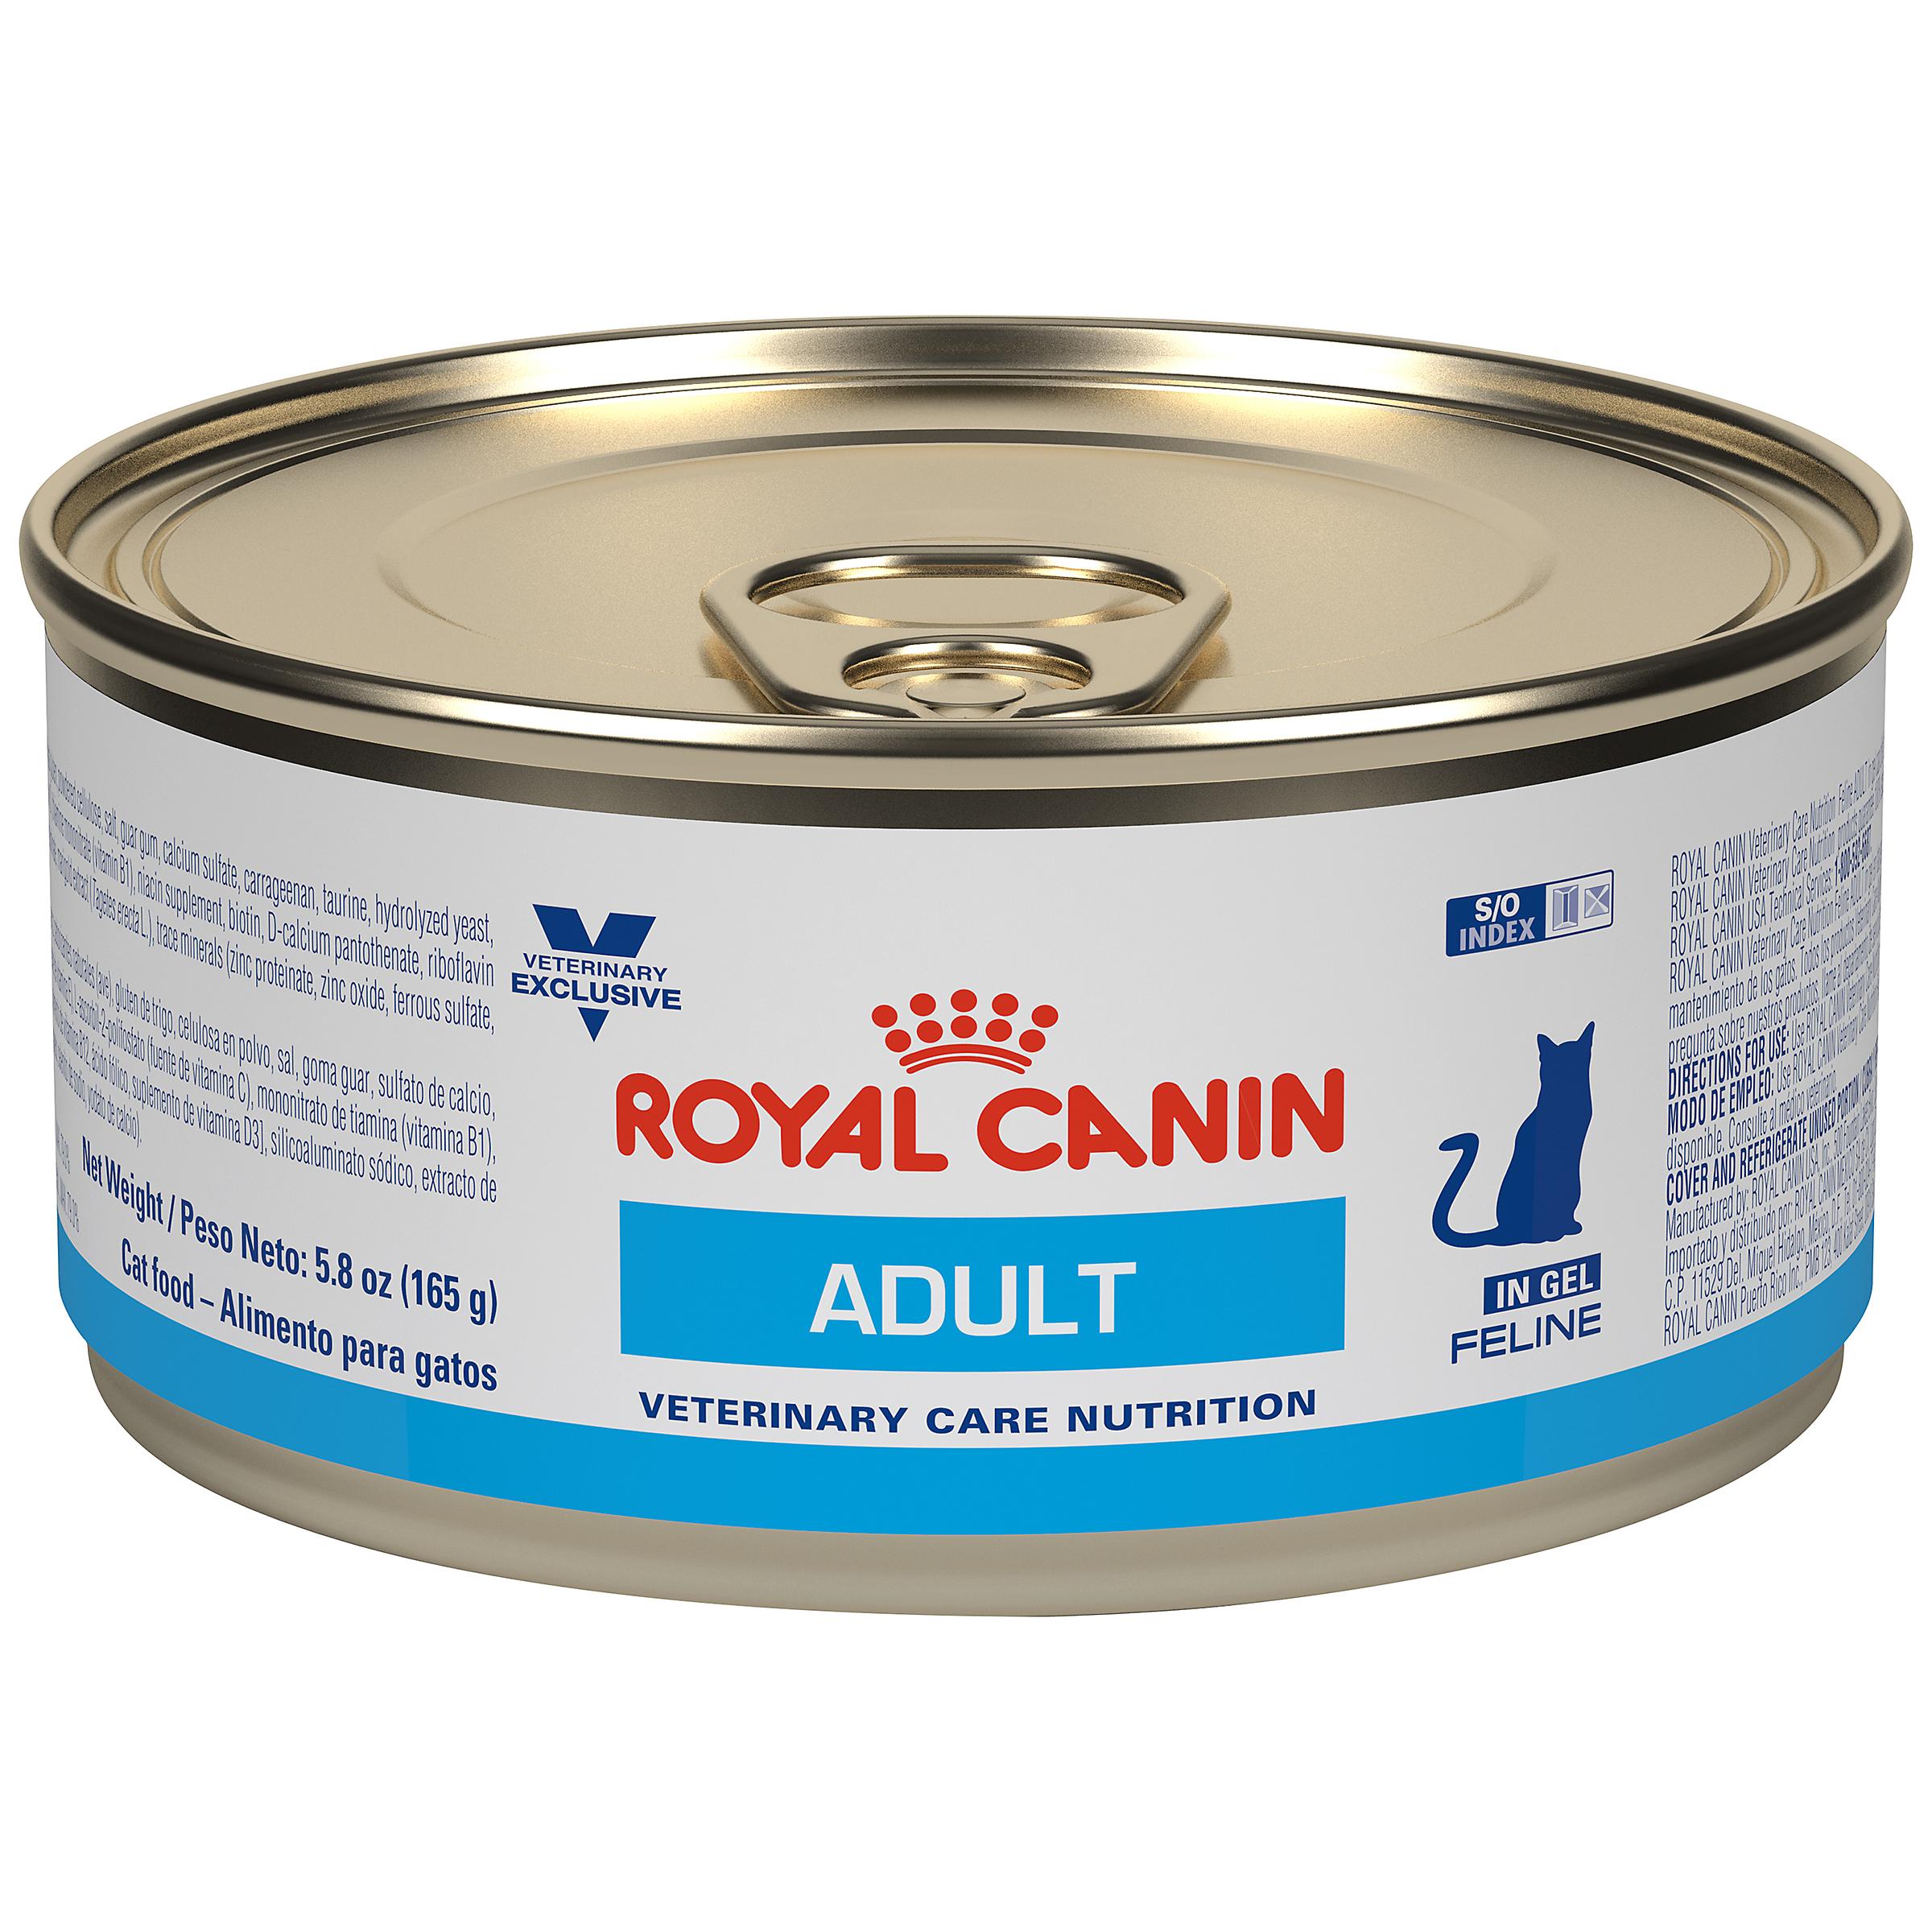 Royal Canin Veterinary Diet Feline Adult In Gel Canned Cat Food